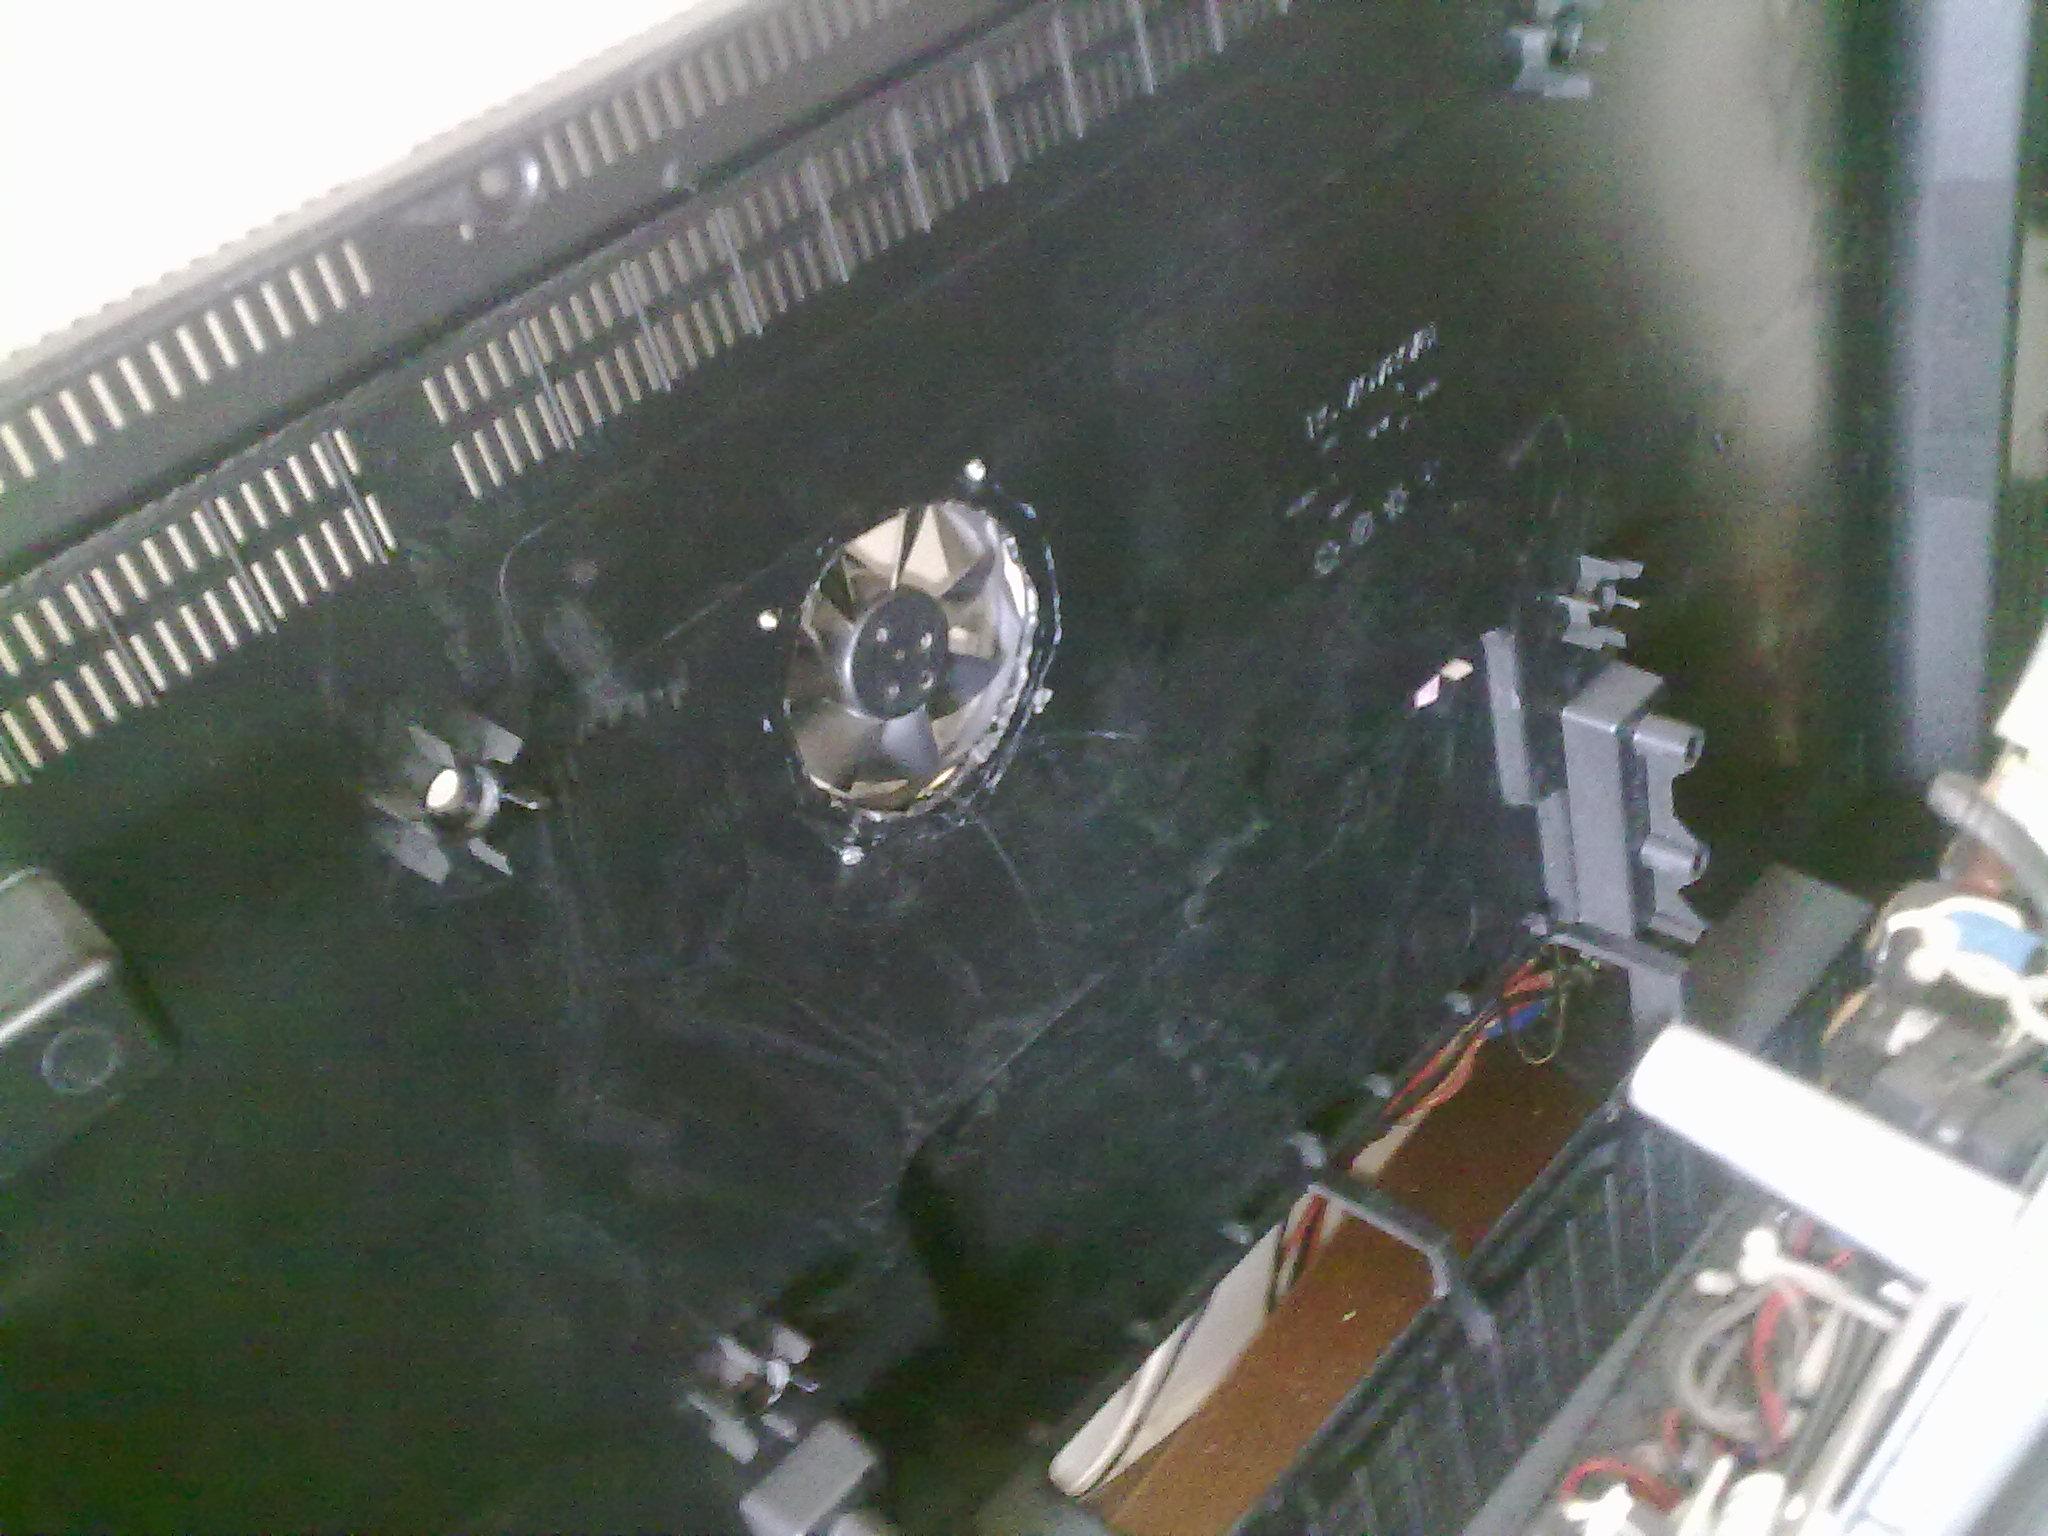 Reparar una tv lcd que se apaga sola soloelectronicos for Mi televisor se escucha pero no se ve la imagen